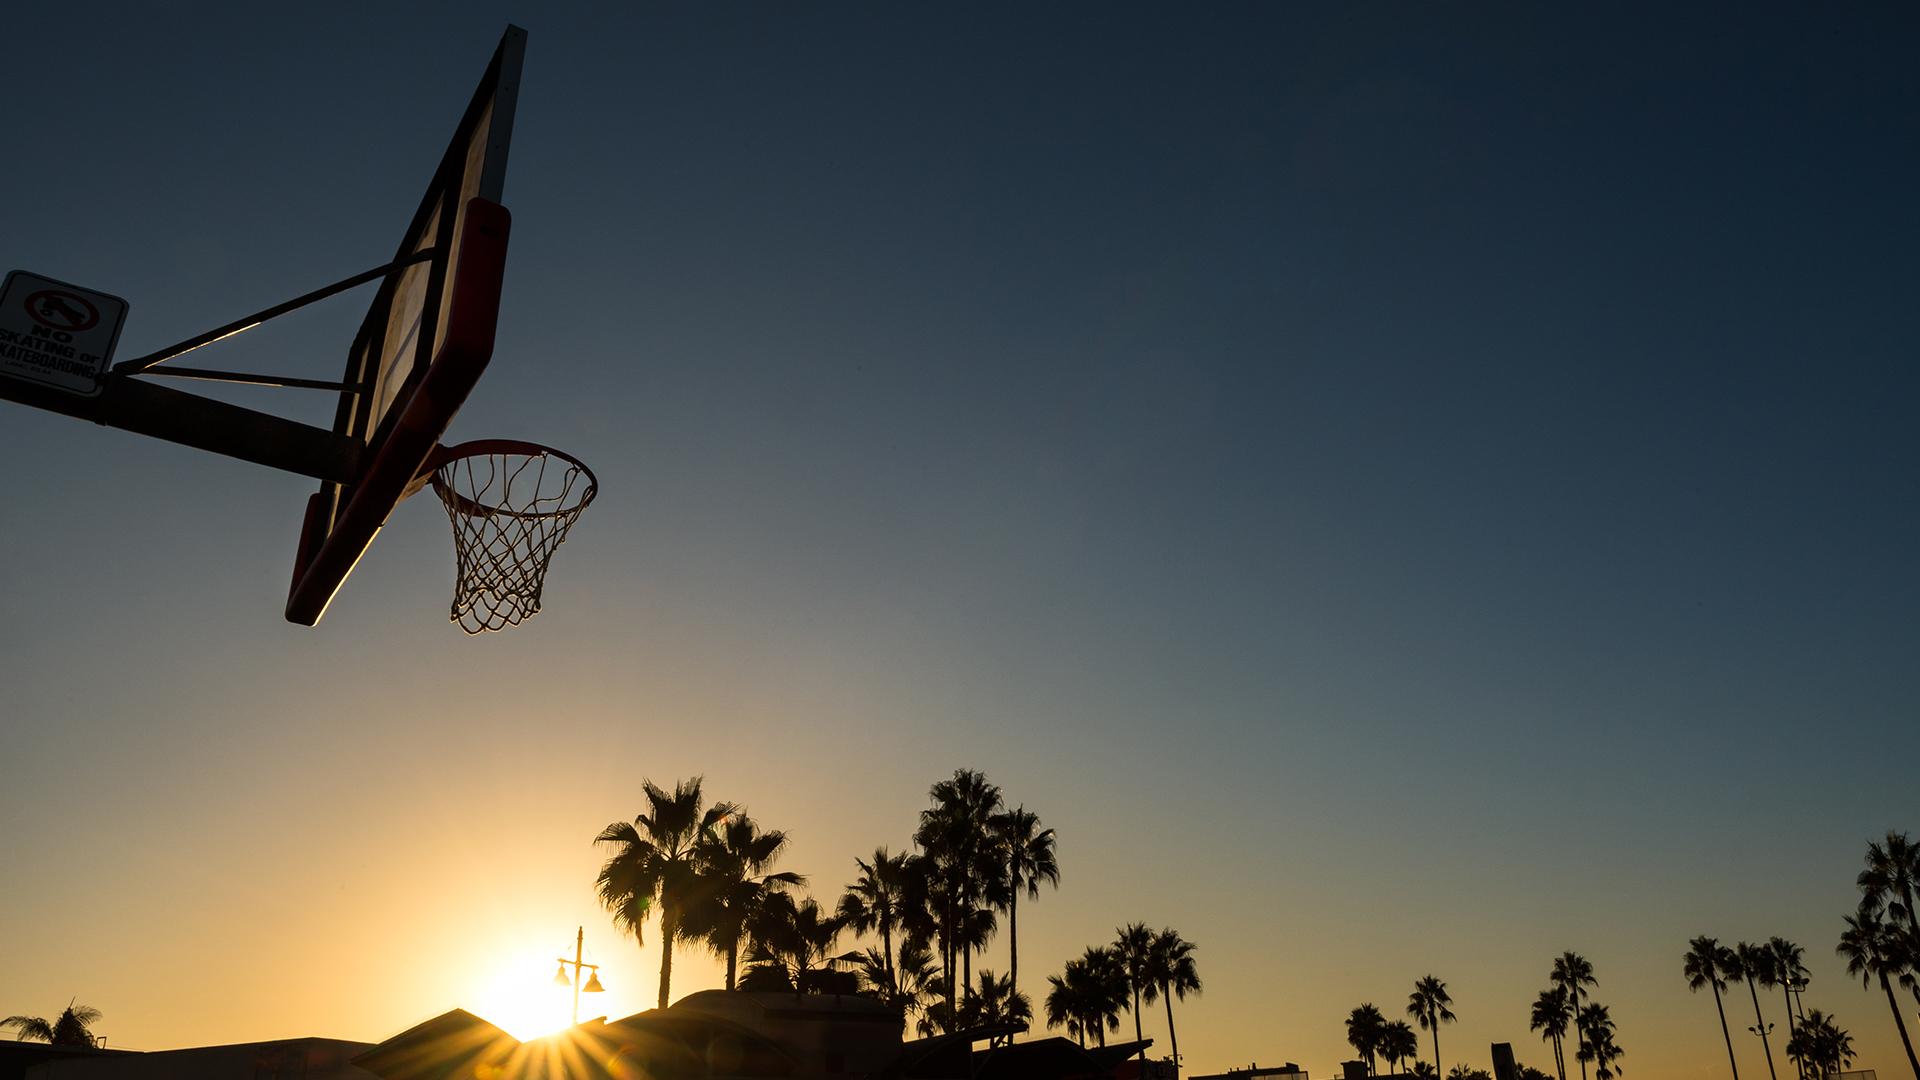 Venice Beach at sunset Los Angeles County California USA 1920x1080